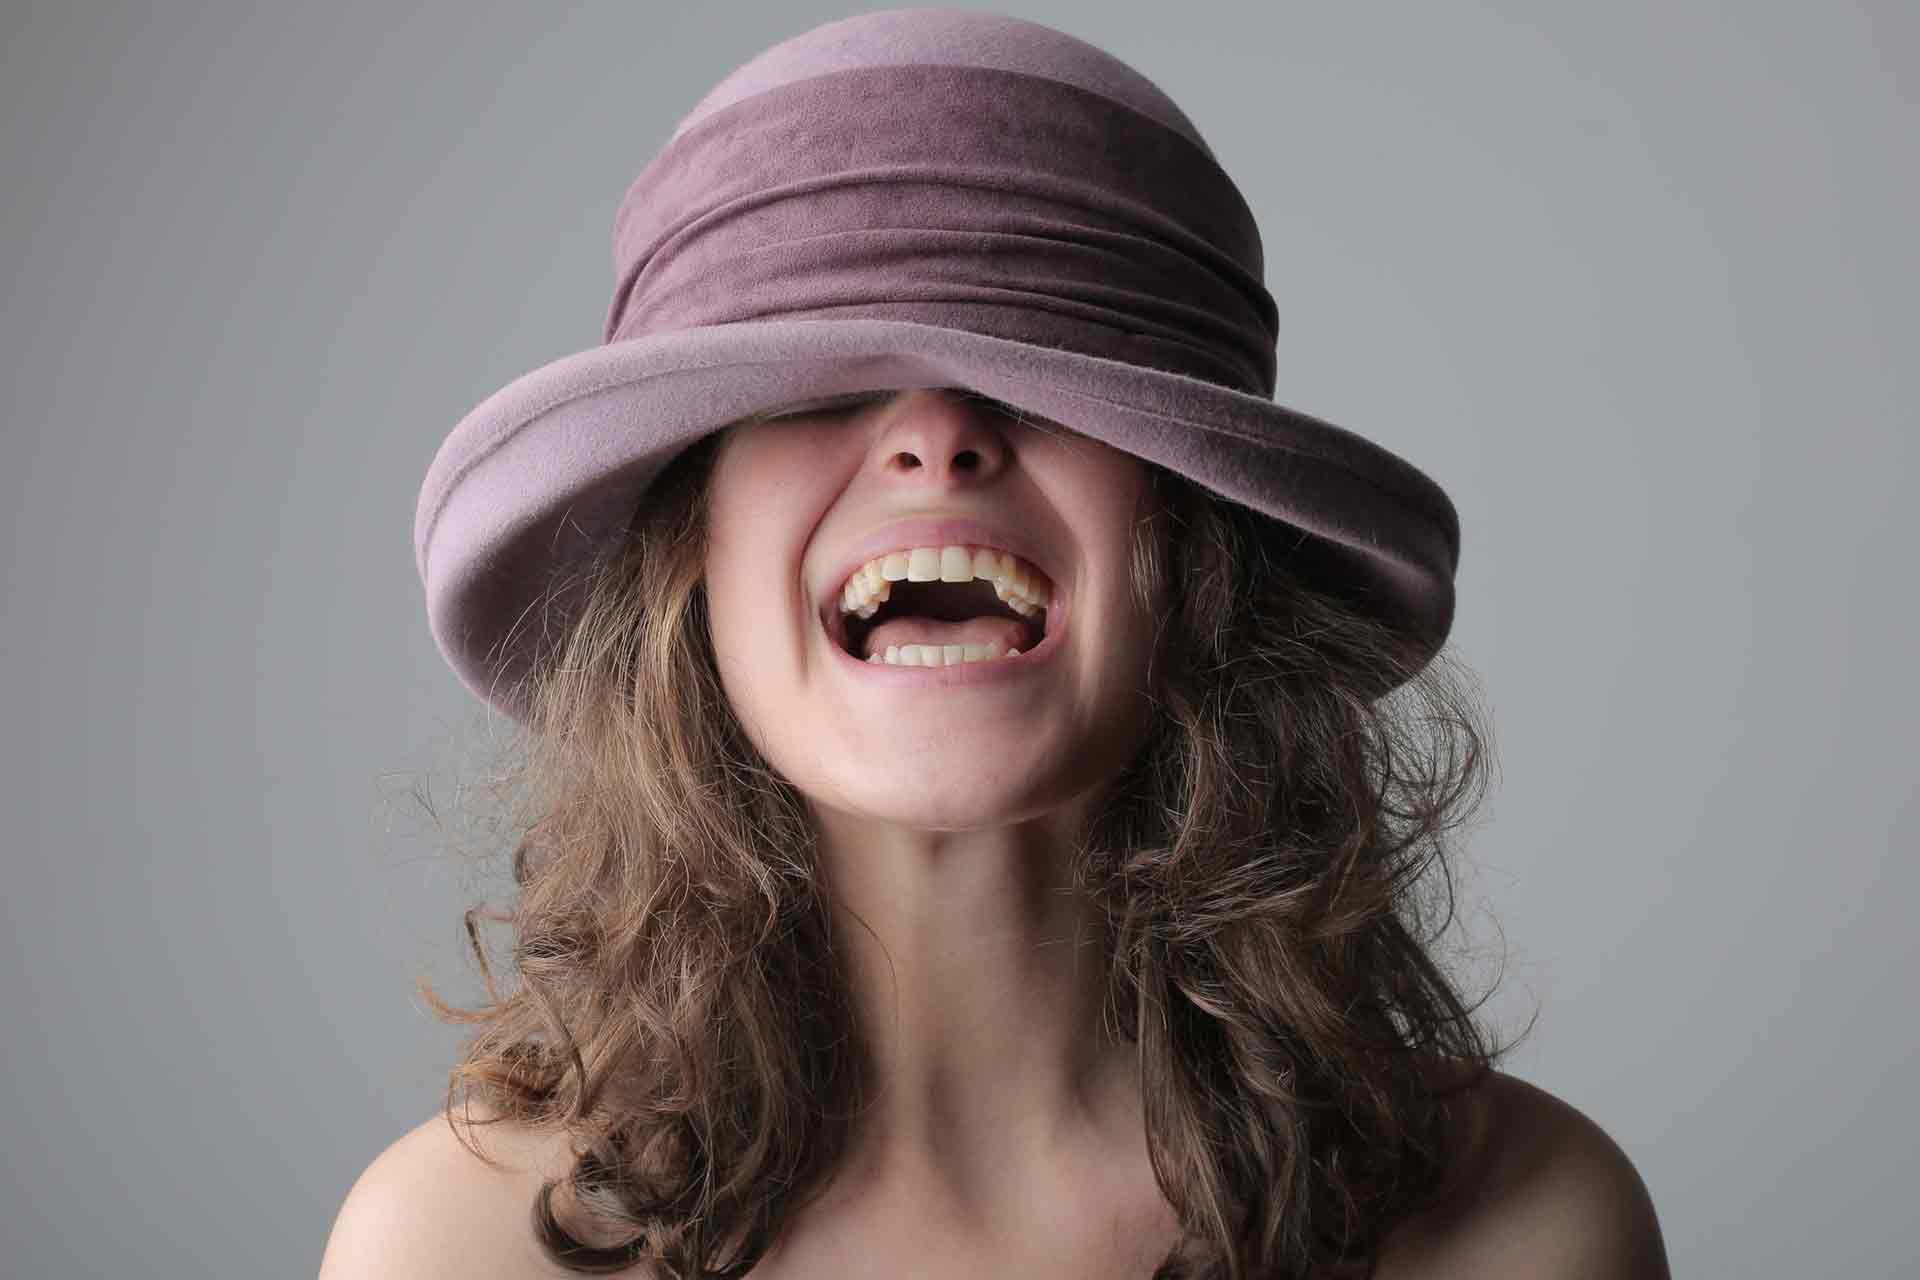 fashion-woman-girl-cute-3979116